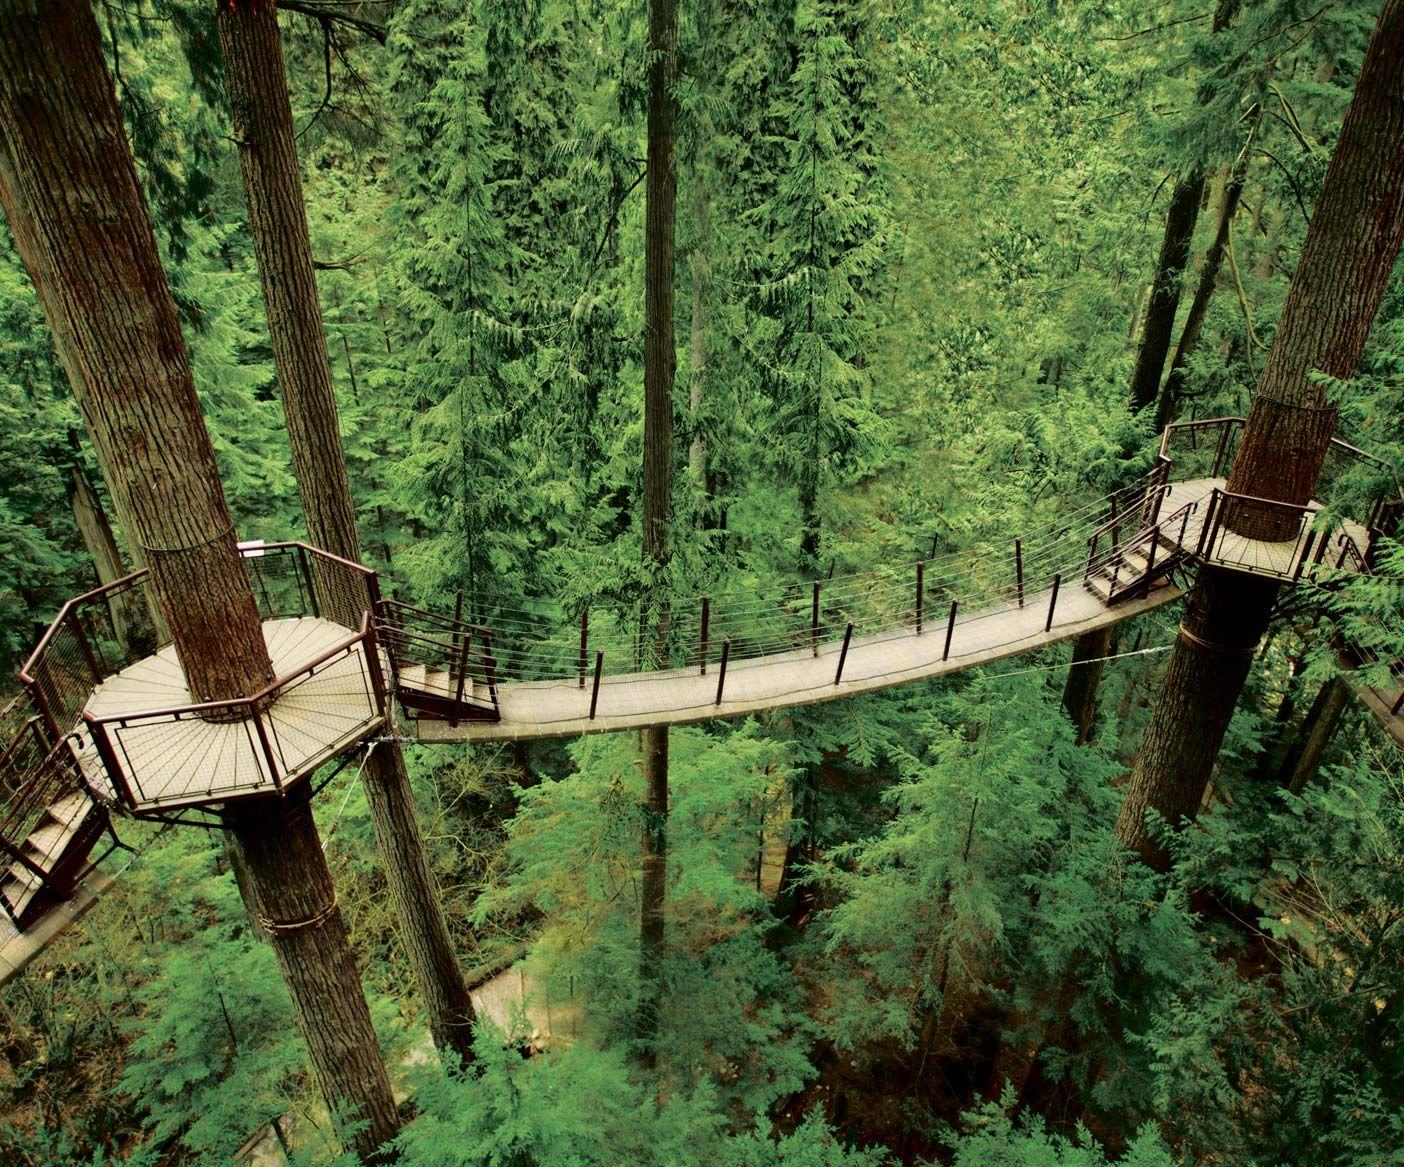 Suspension Bridge - From Earliest to Modern Designs